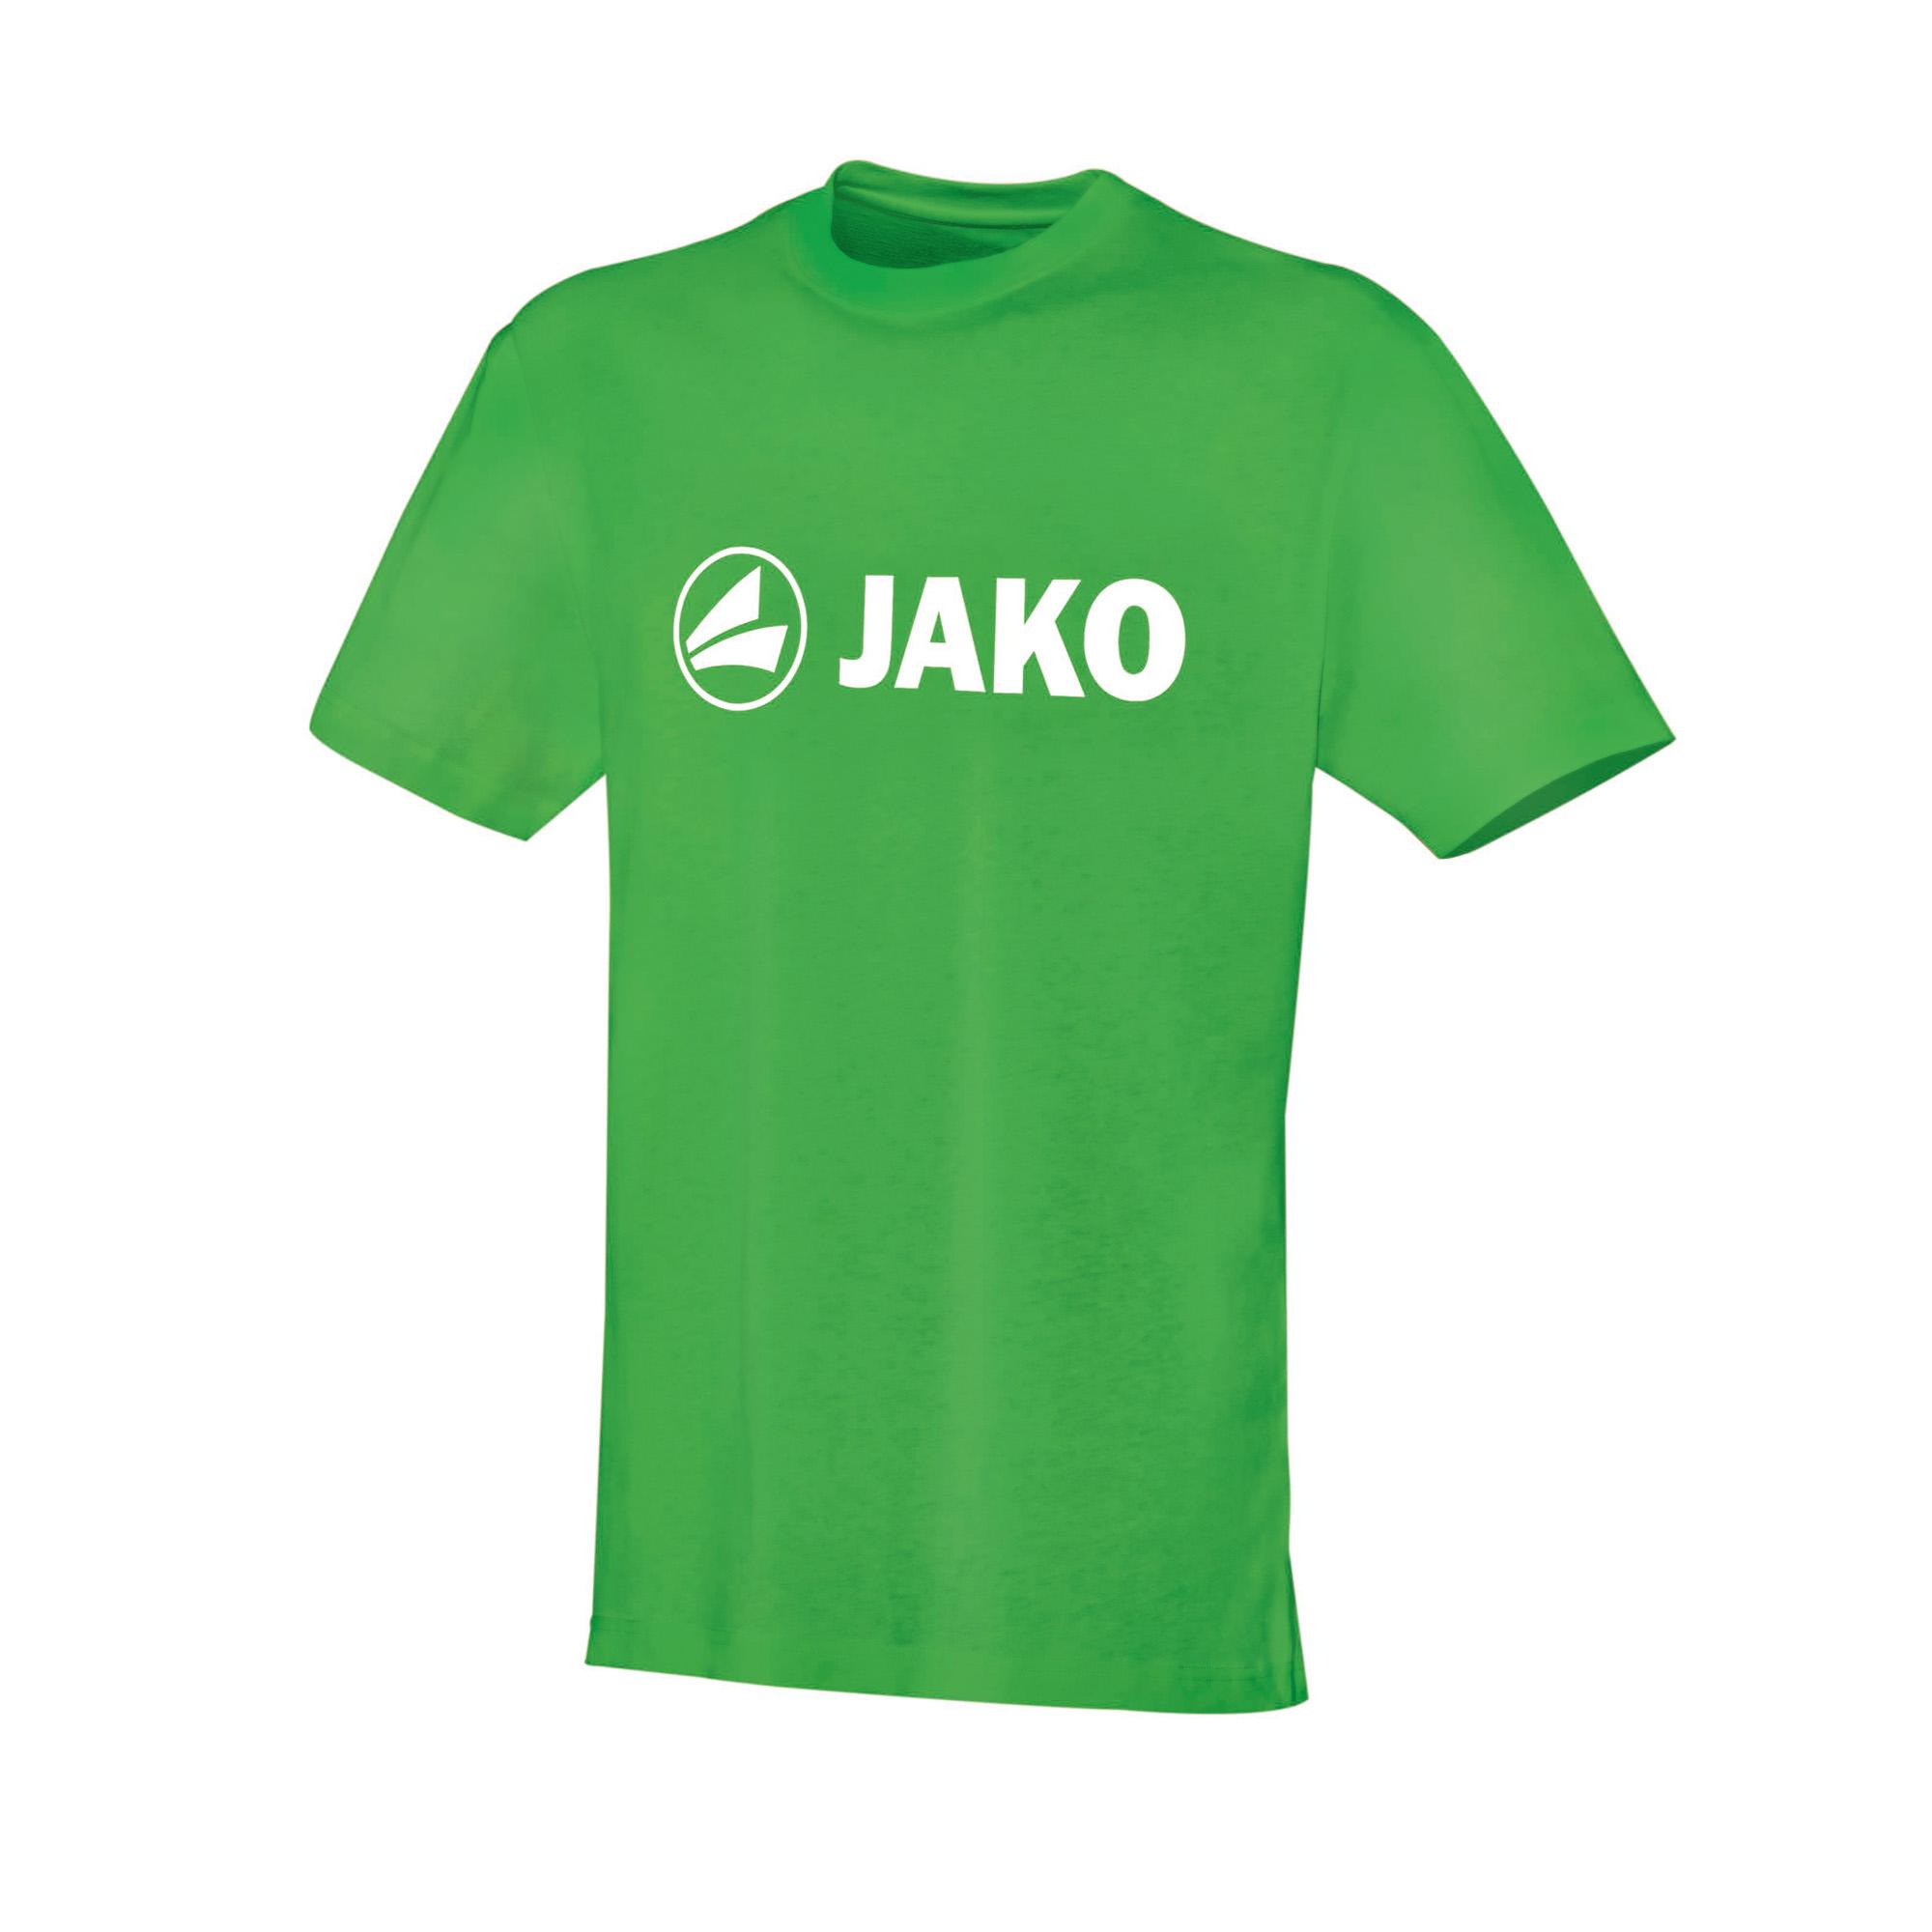 Jako Herren T-Shirt Promo 6163-22 M